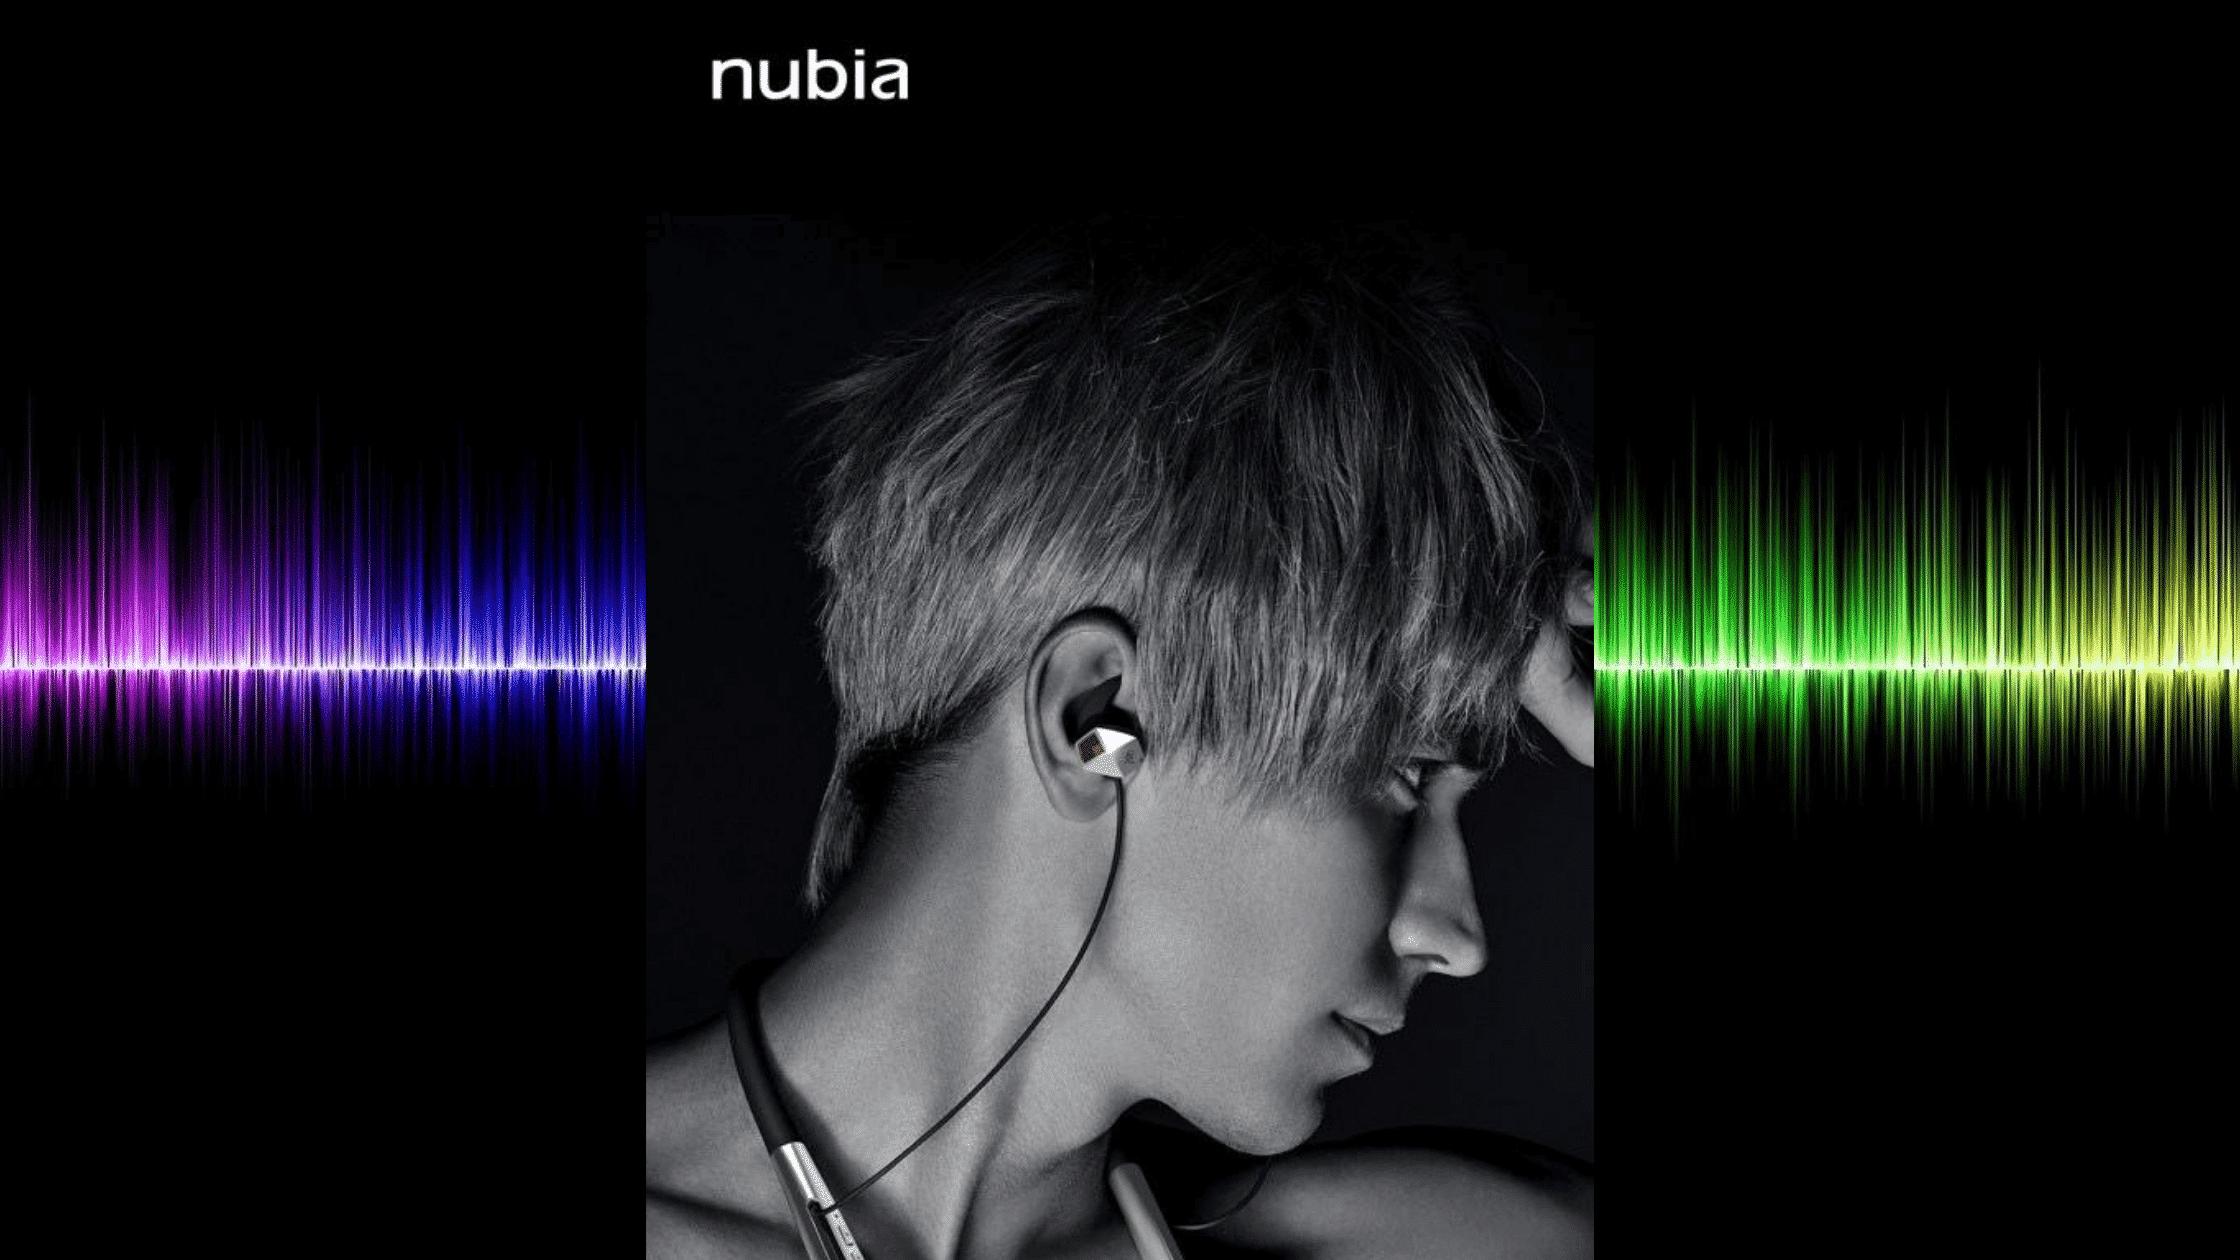 Headphone Bluetooth Red Magic Neckband